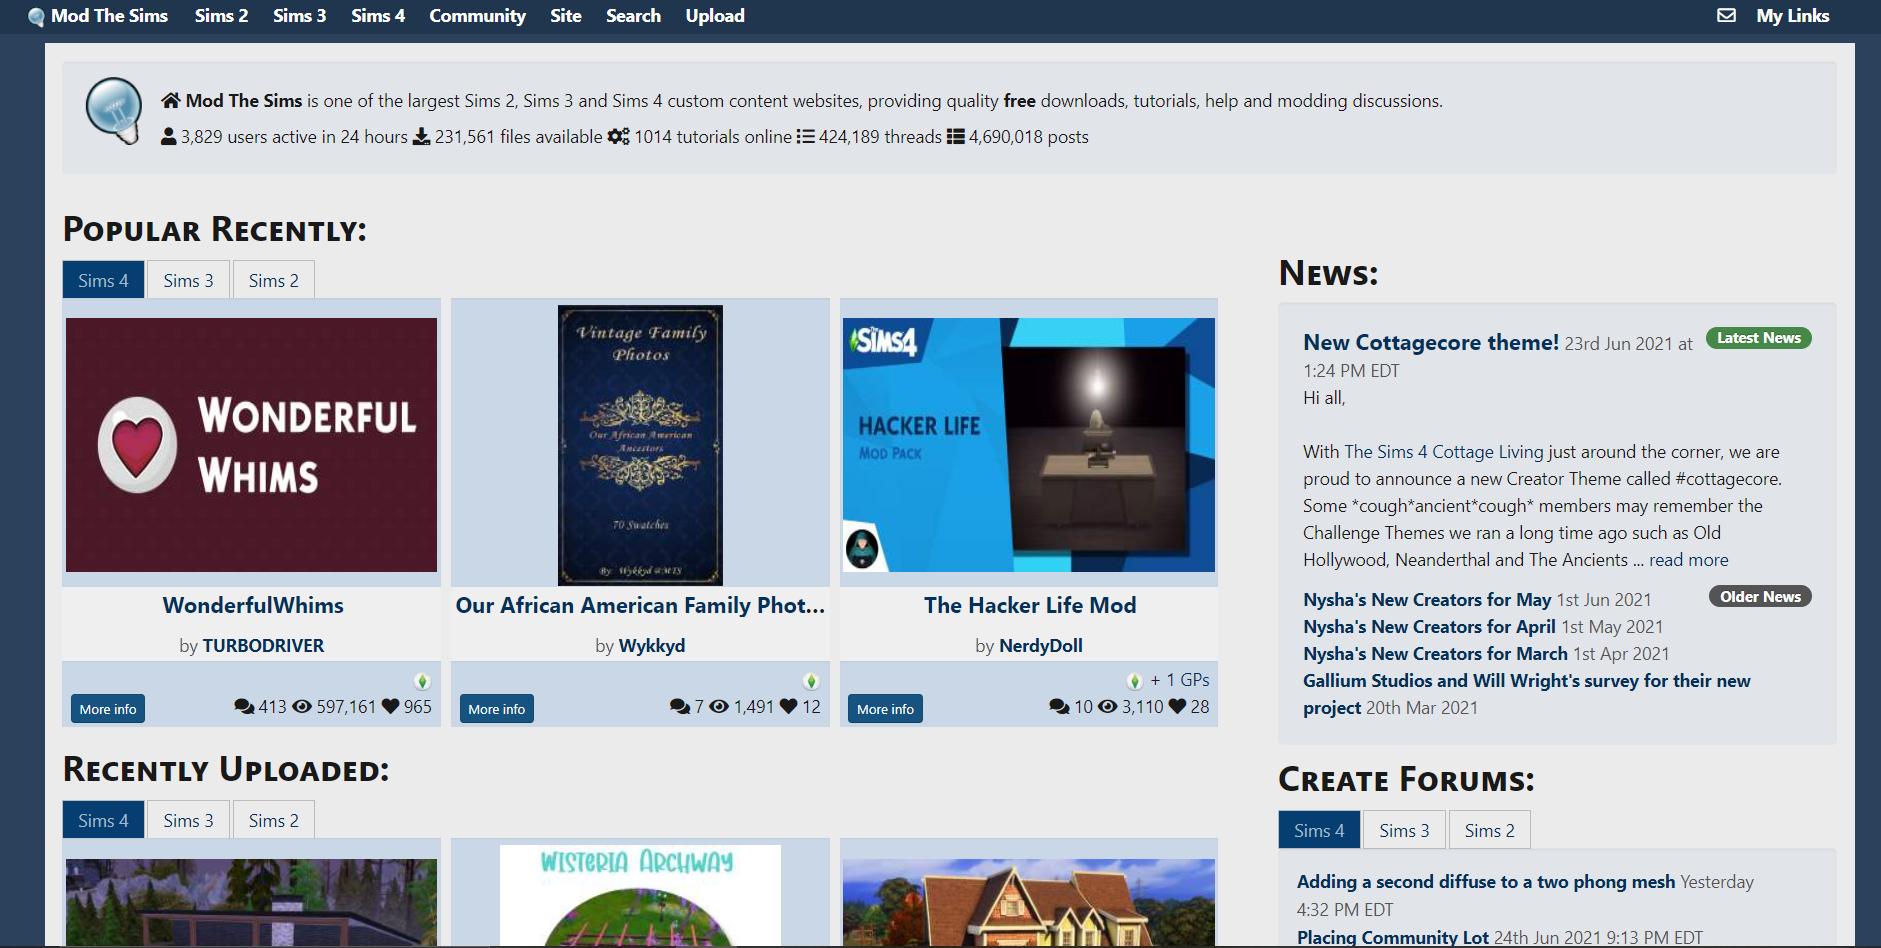 Mod The Sims The Sims Wiki Fandom